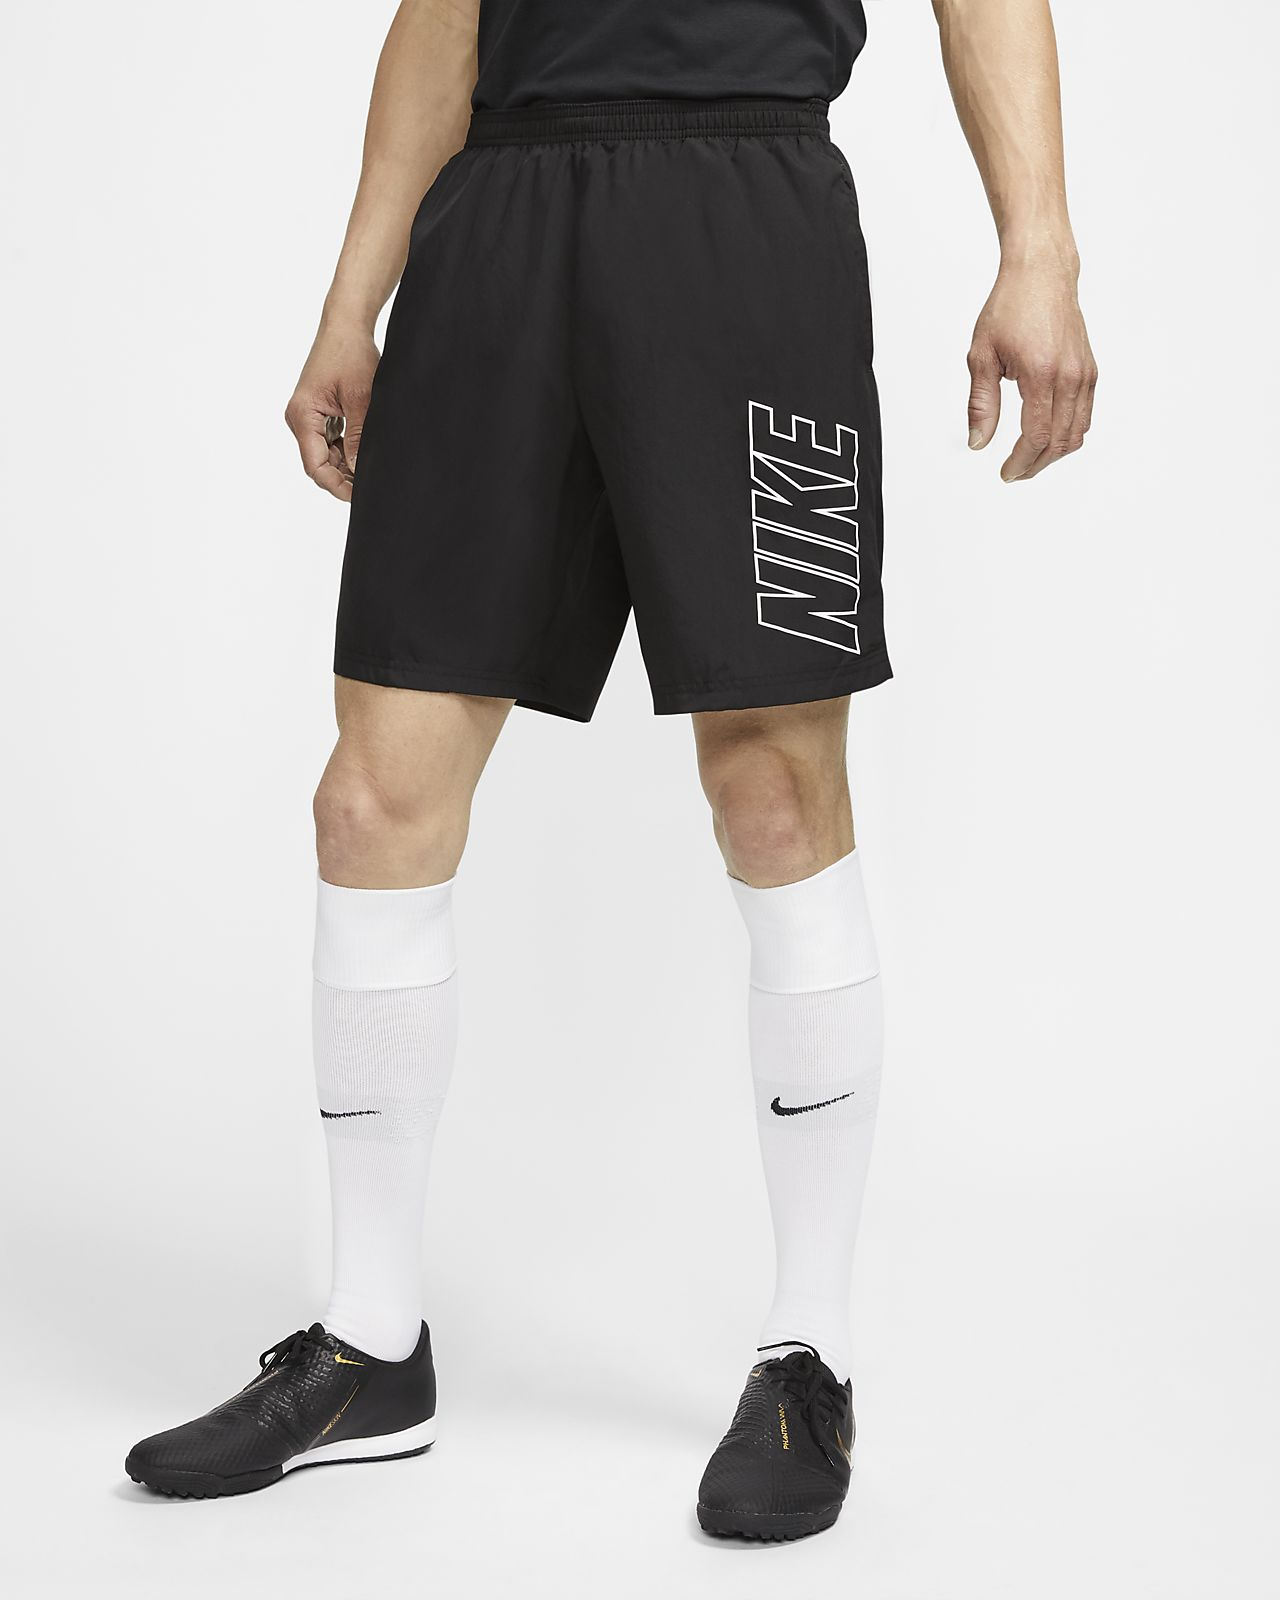 Nike Dri-FIT Academy 男子足球短裤